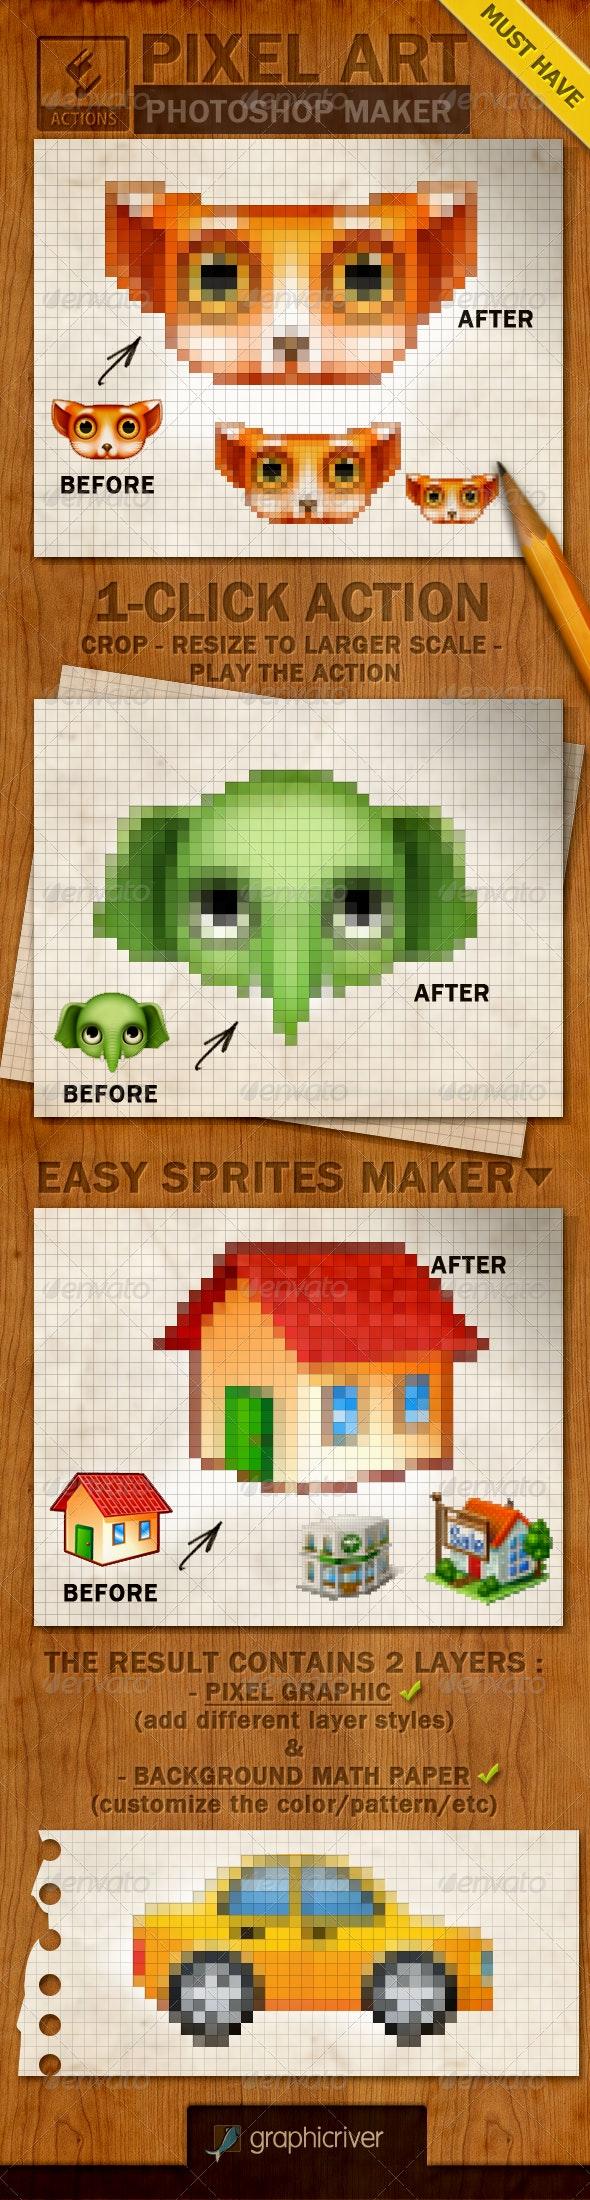 Pixel Art Creator Photoshop Action